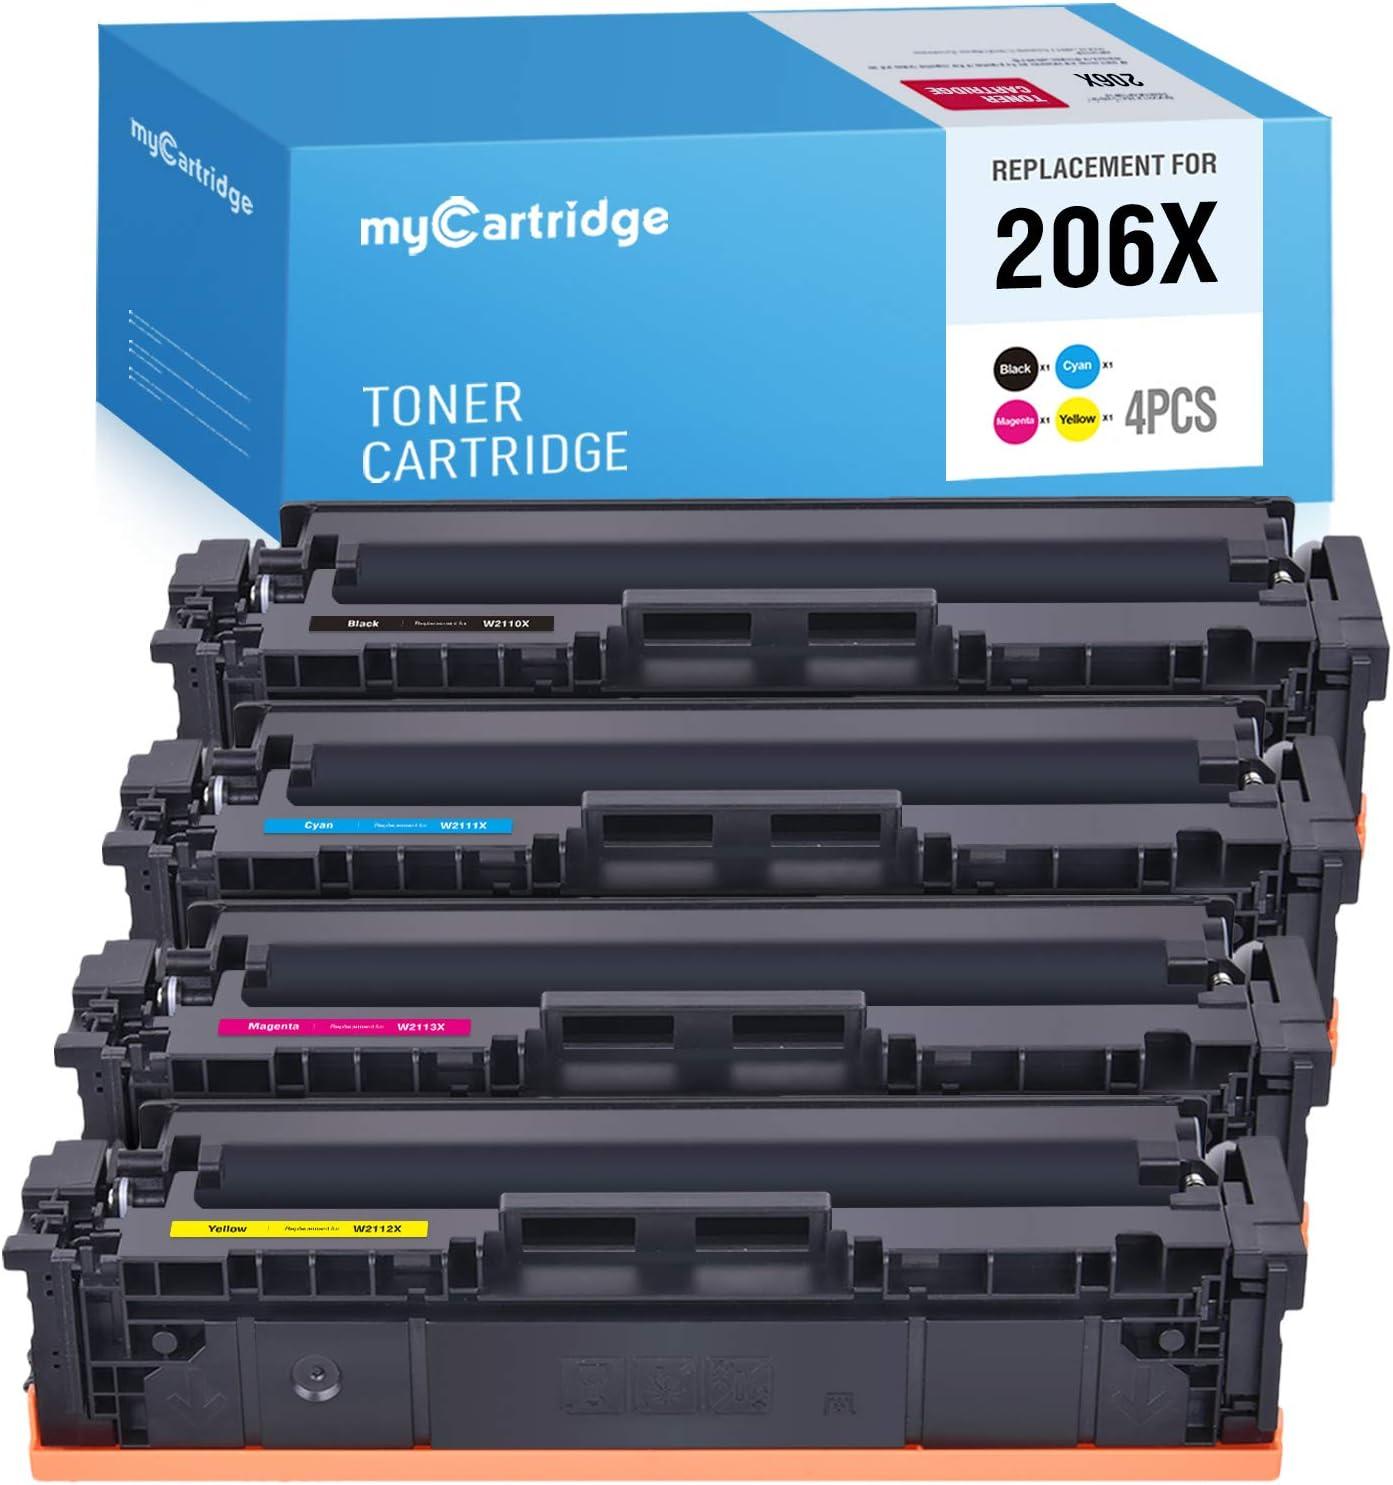 MYCARTRIDGE (NO CHIP) Compatible Toner Cartridge Replacement for HP 206X W2110X W2111X W2112X W2113X for Color Laserjet Pro M255dw MFP M283fdw M283cdw M282nw (Black, Cyan, Magenta, Yellow, 4-Pack)